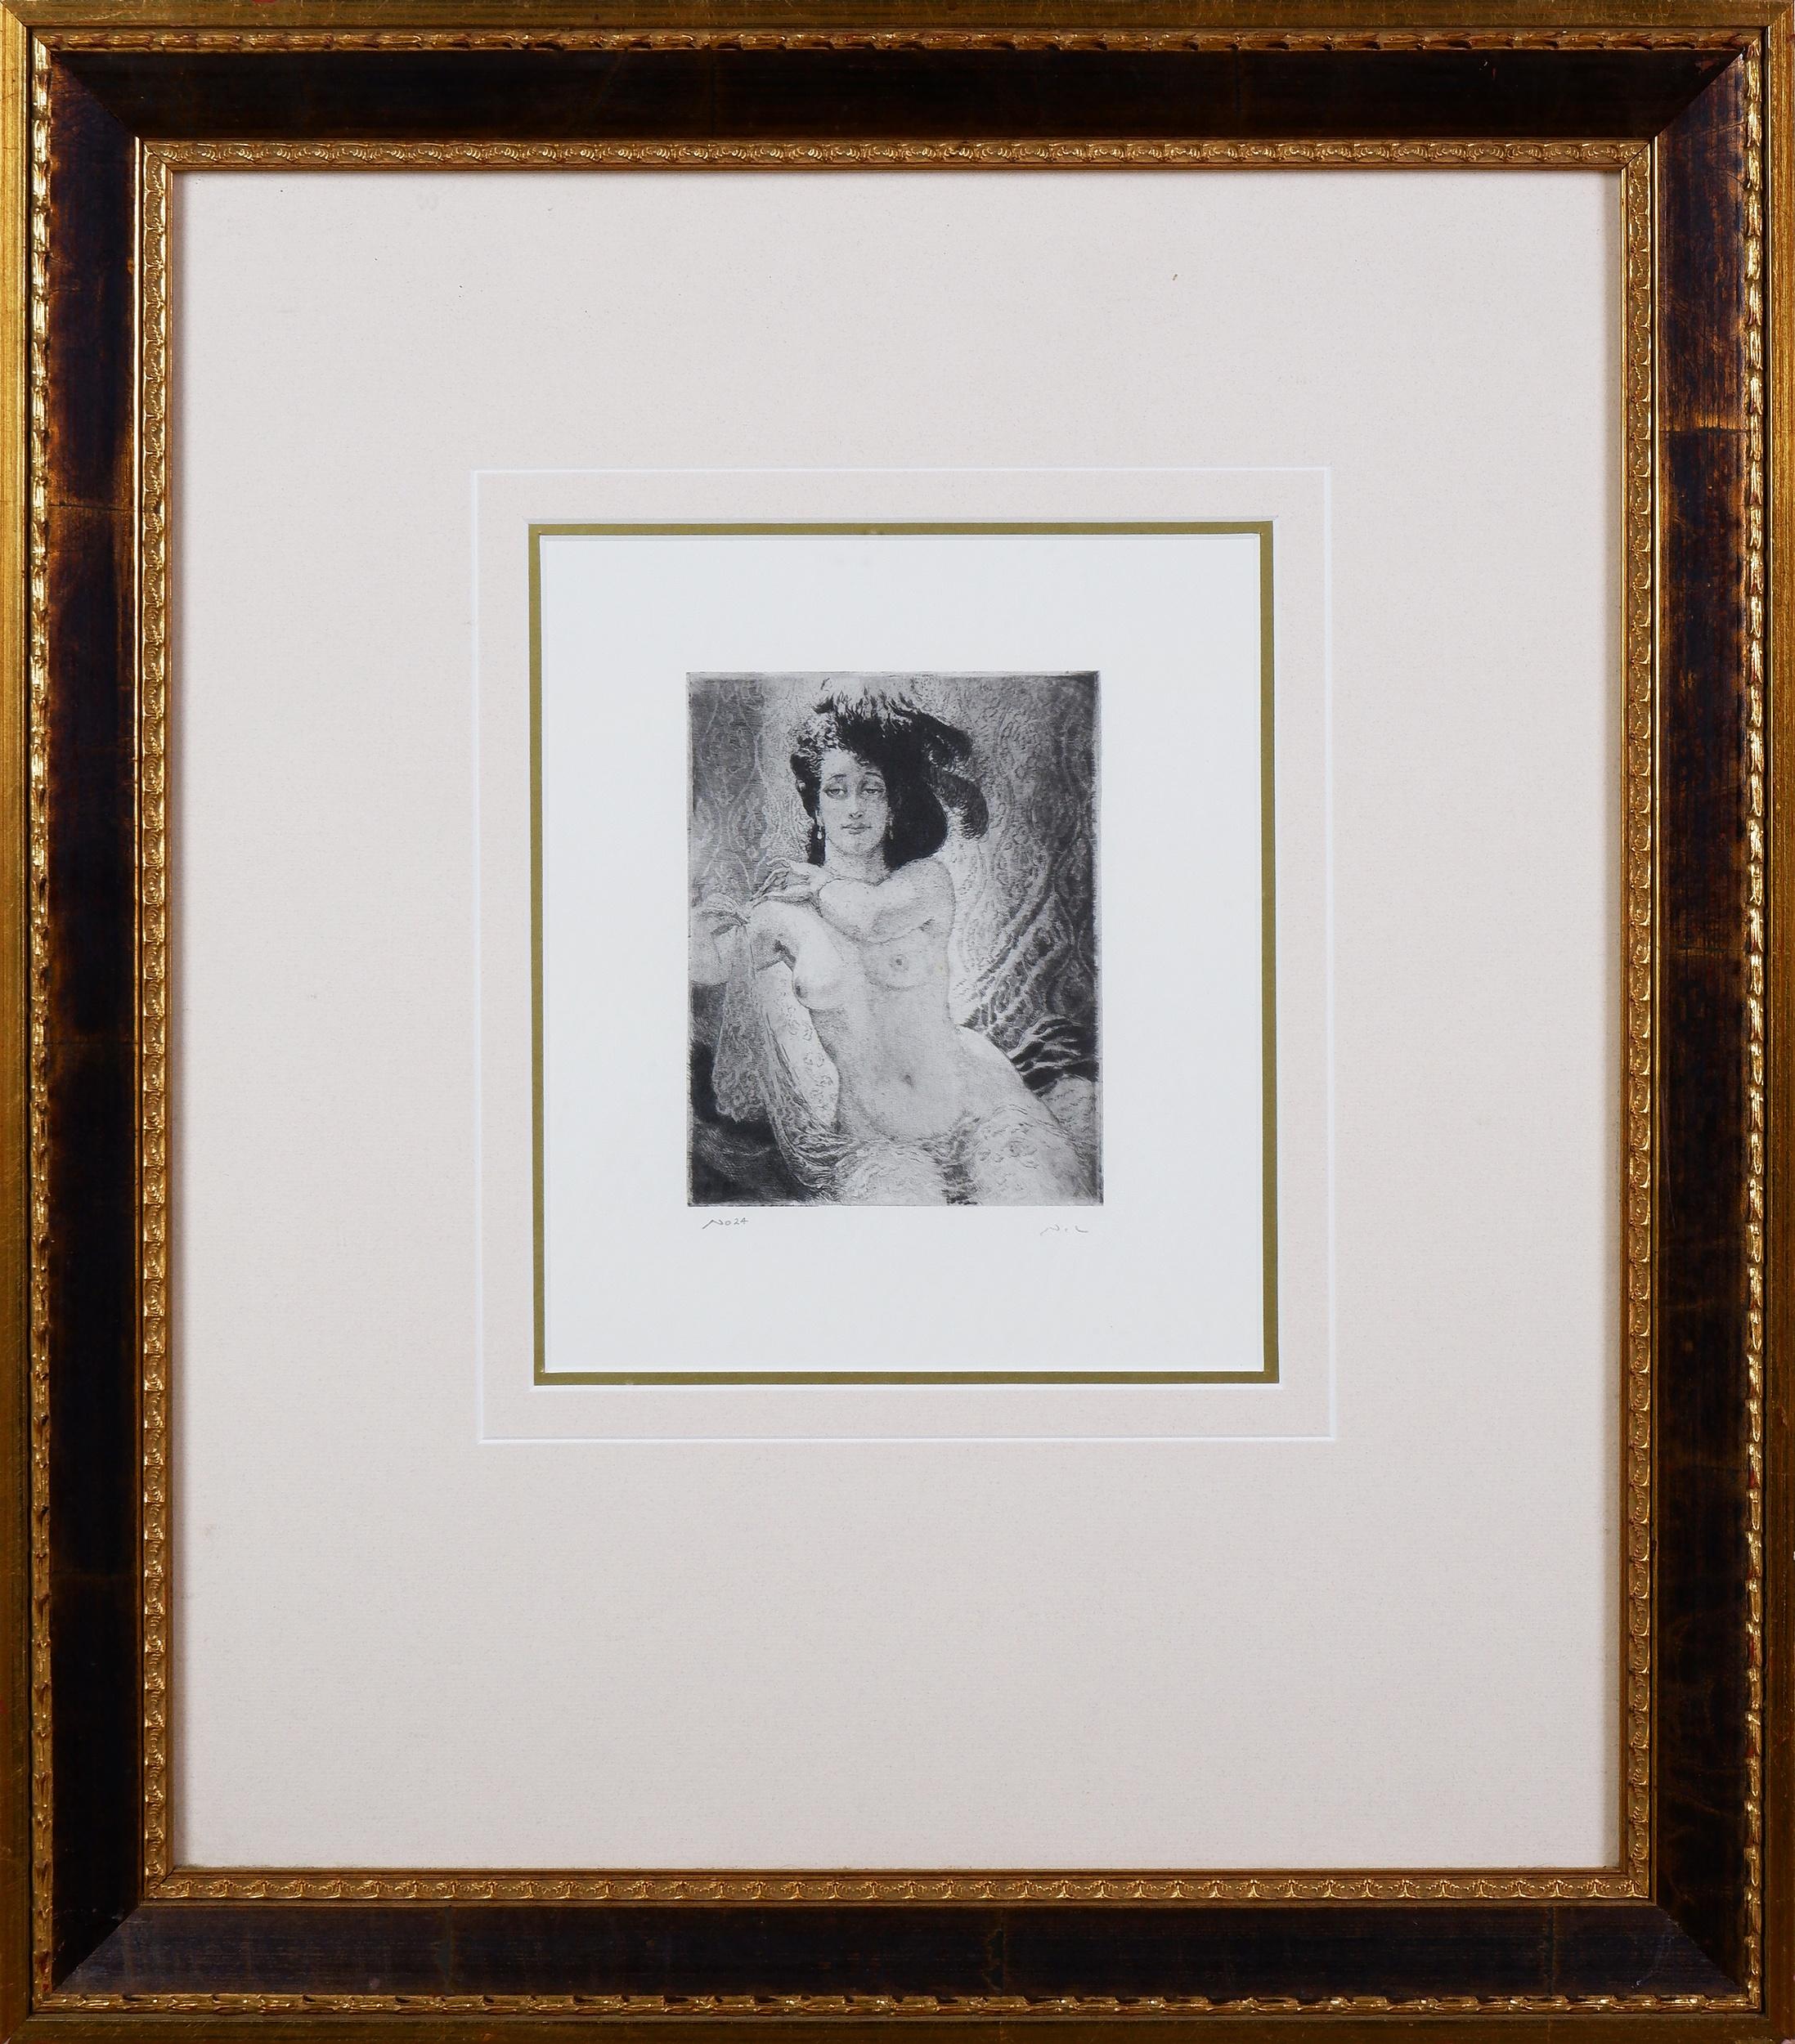 'Norman Lindsay (1879-1969), Rita, Facsimile Etching, 14.5 x 11 cm'